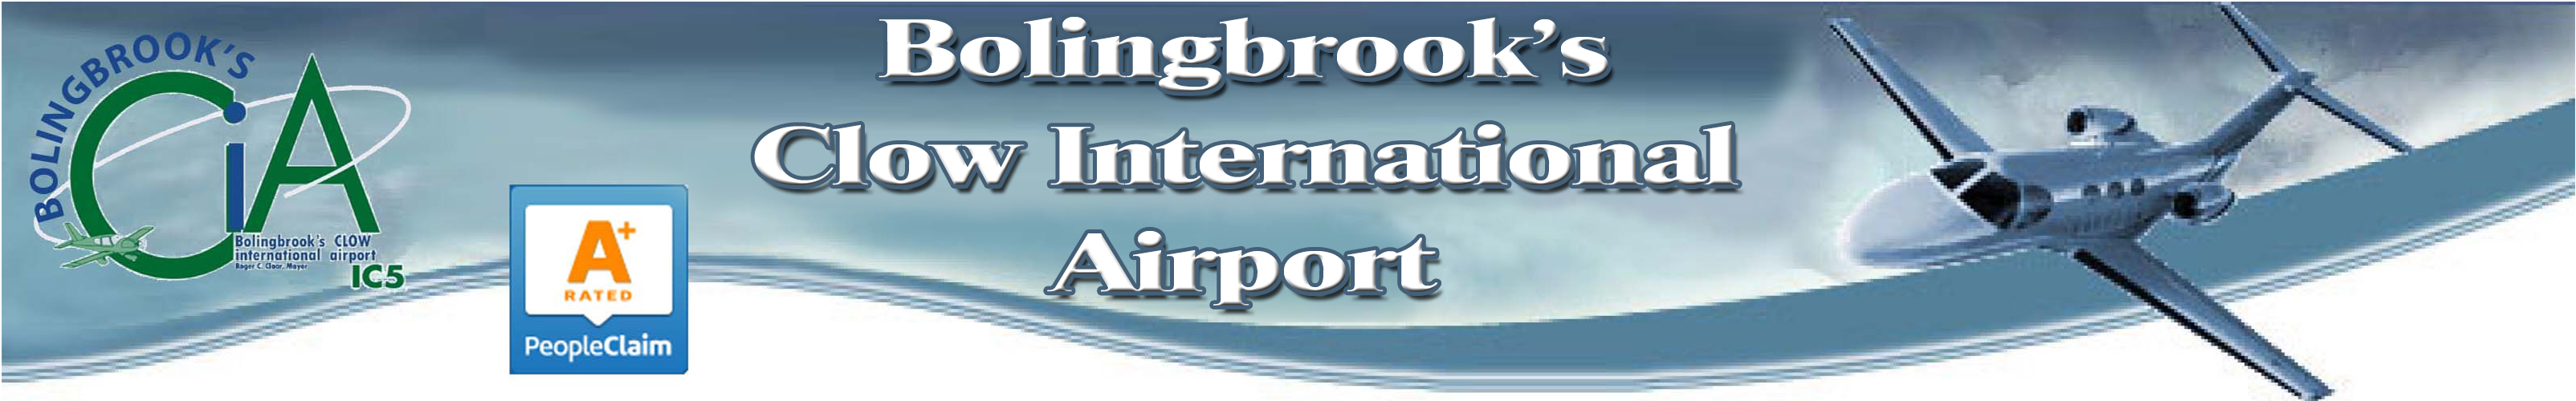 Clow International Airport